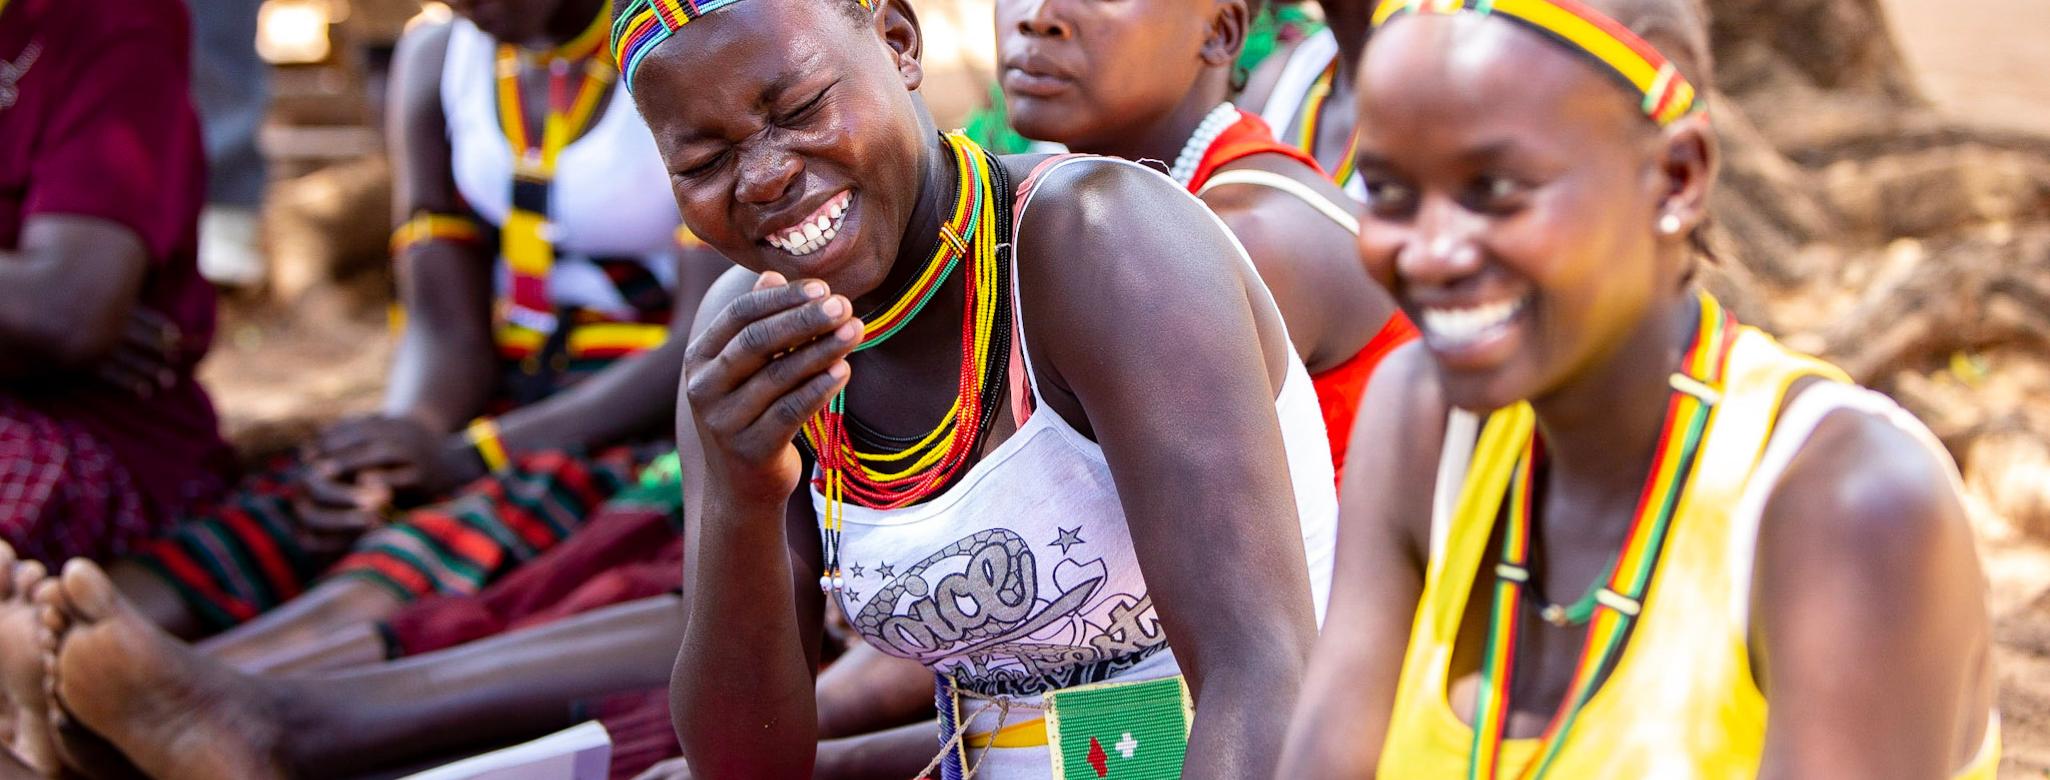 women in uganda learning business skills